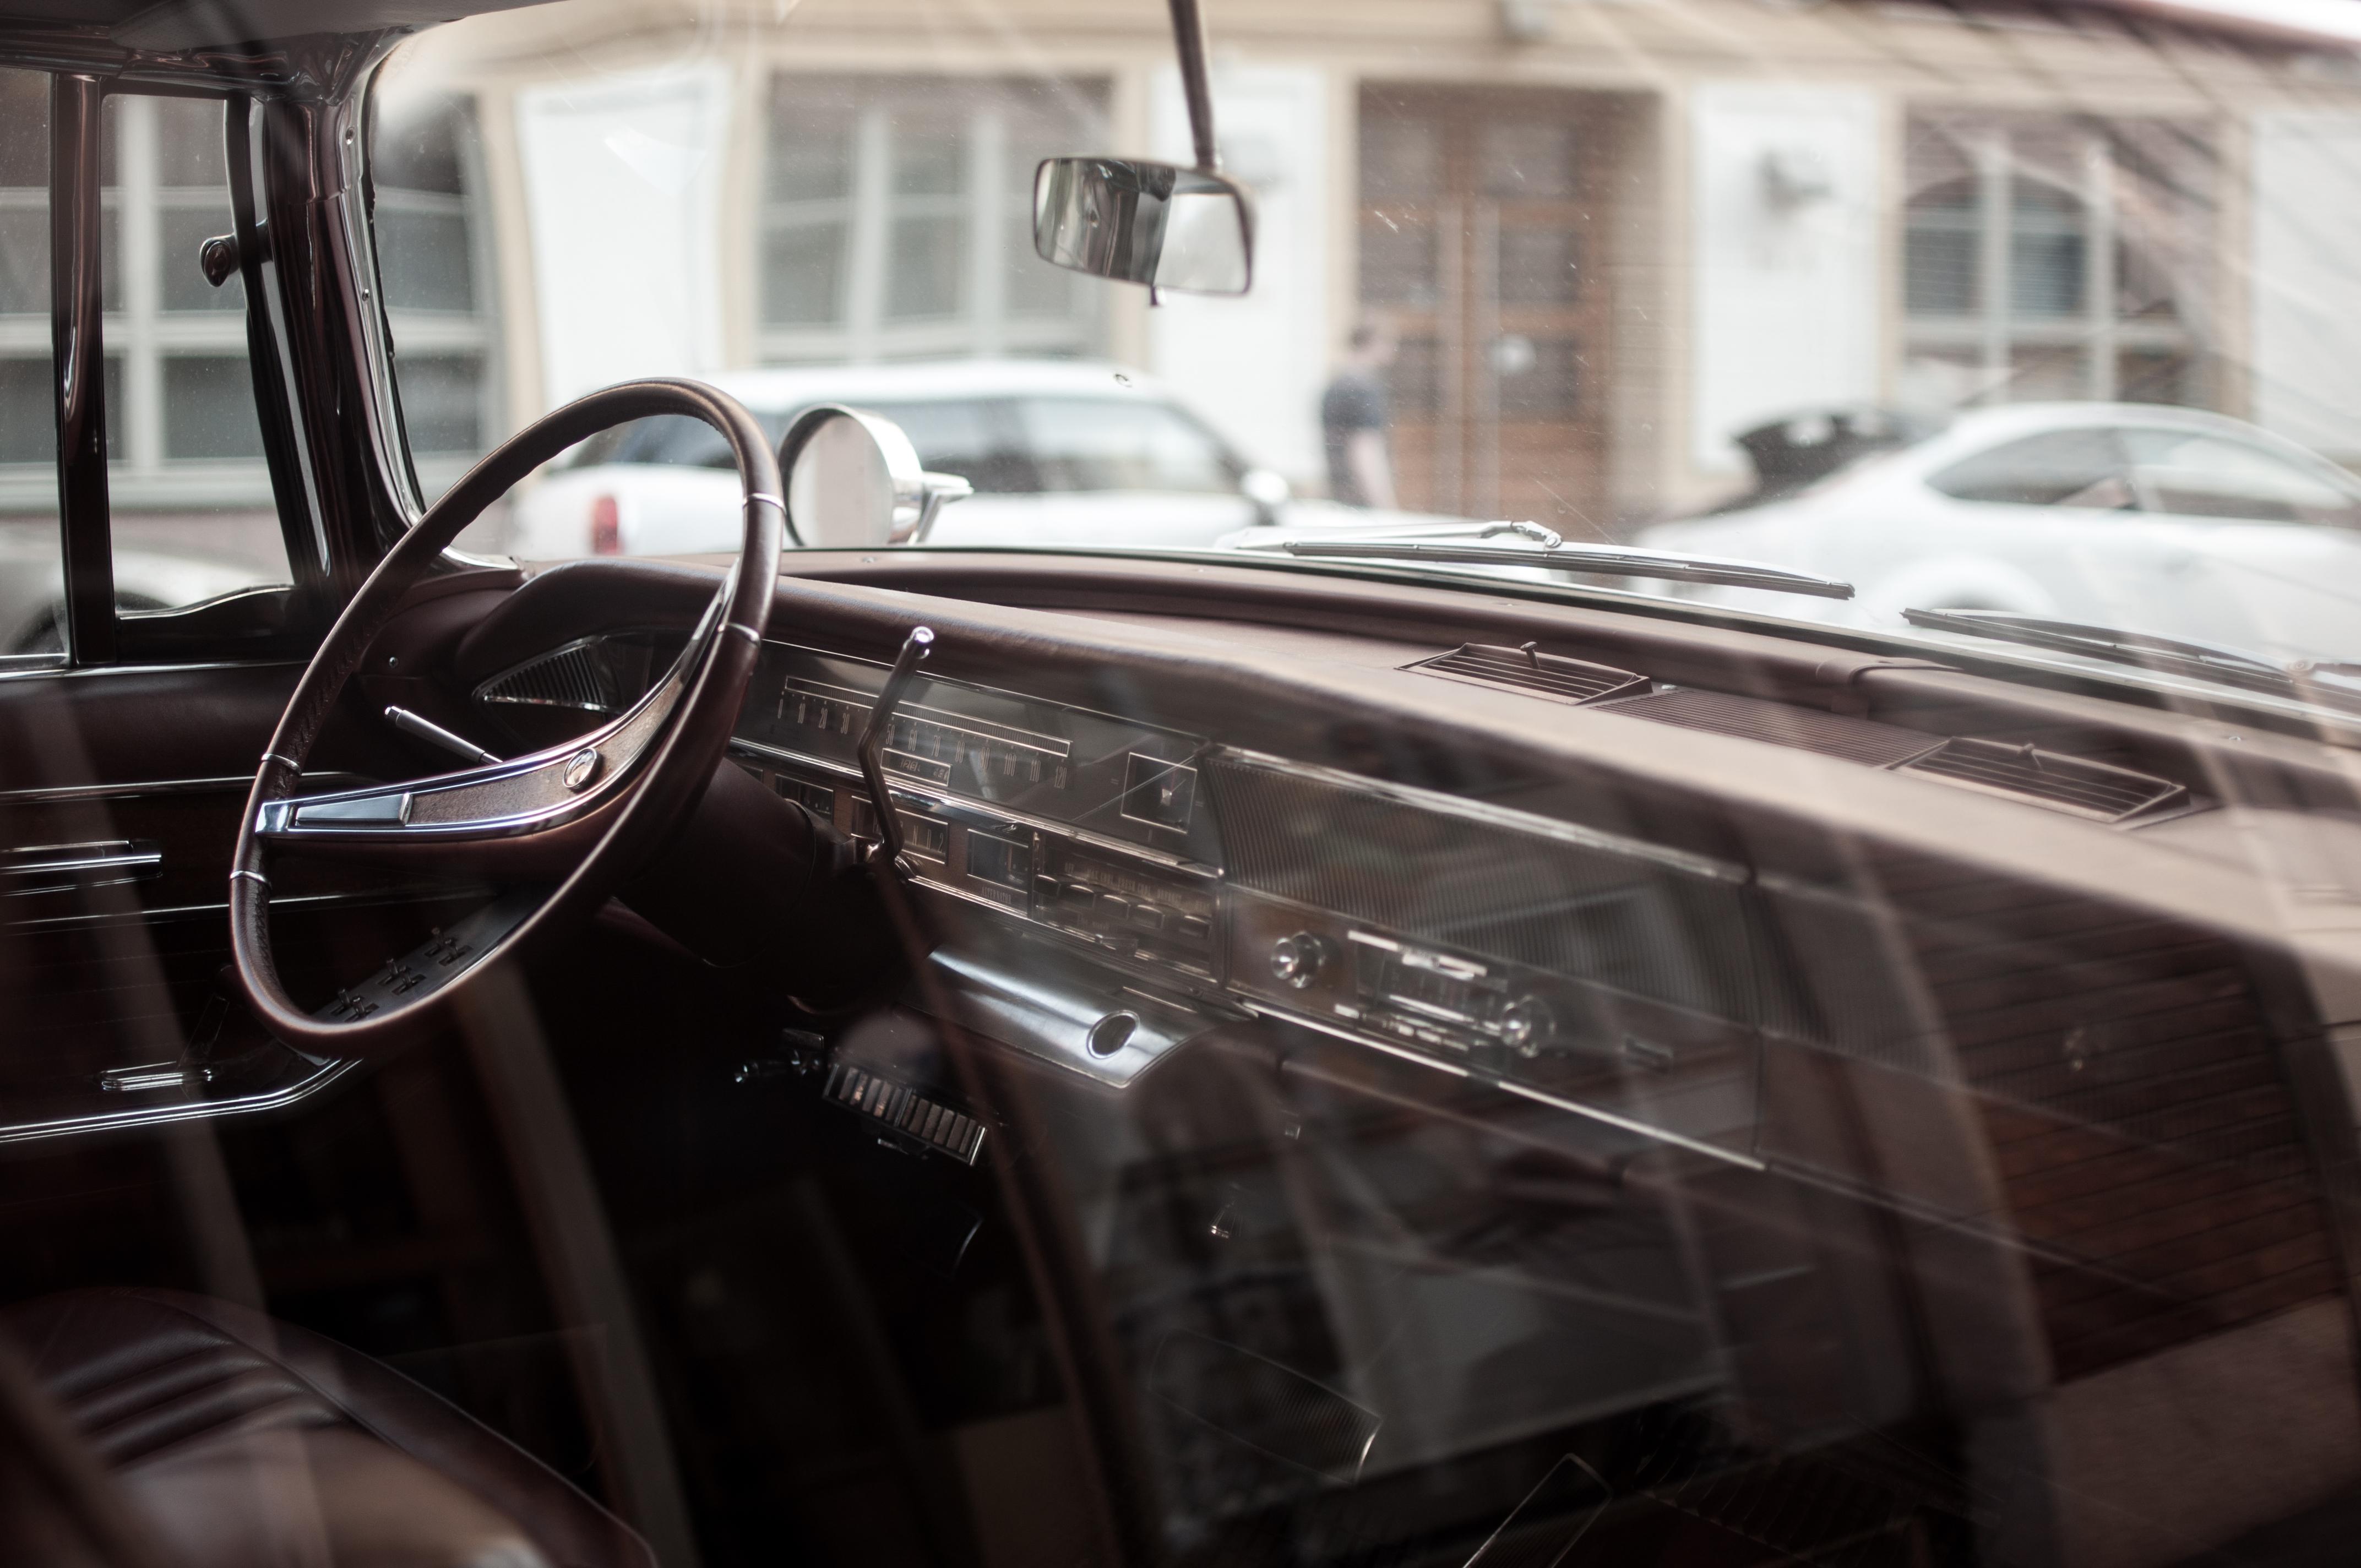 Automobile Dash and Steering Wheel, Automobile, Car, Dash, Glass, HQ Photo